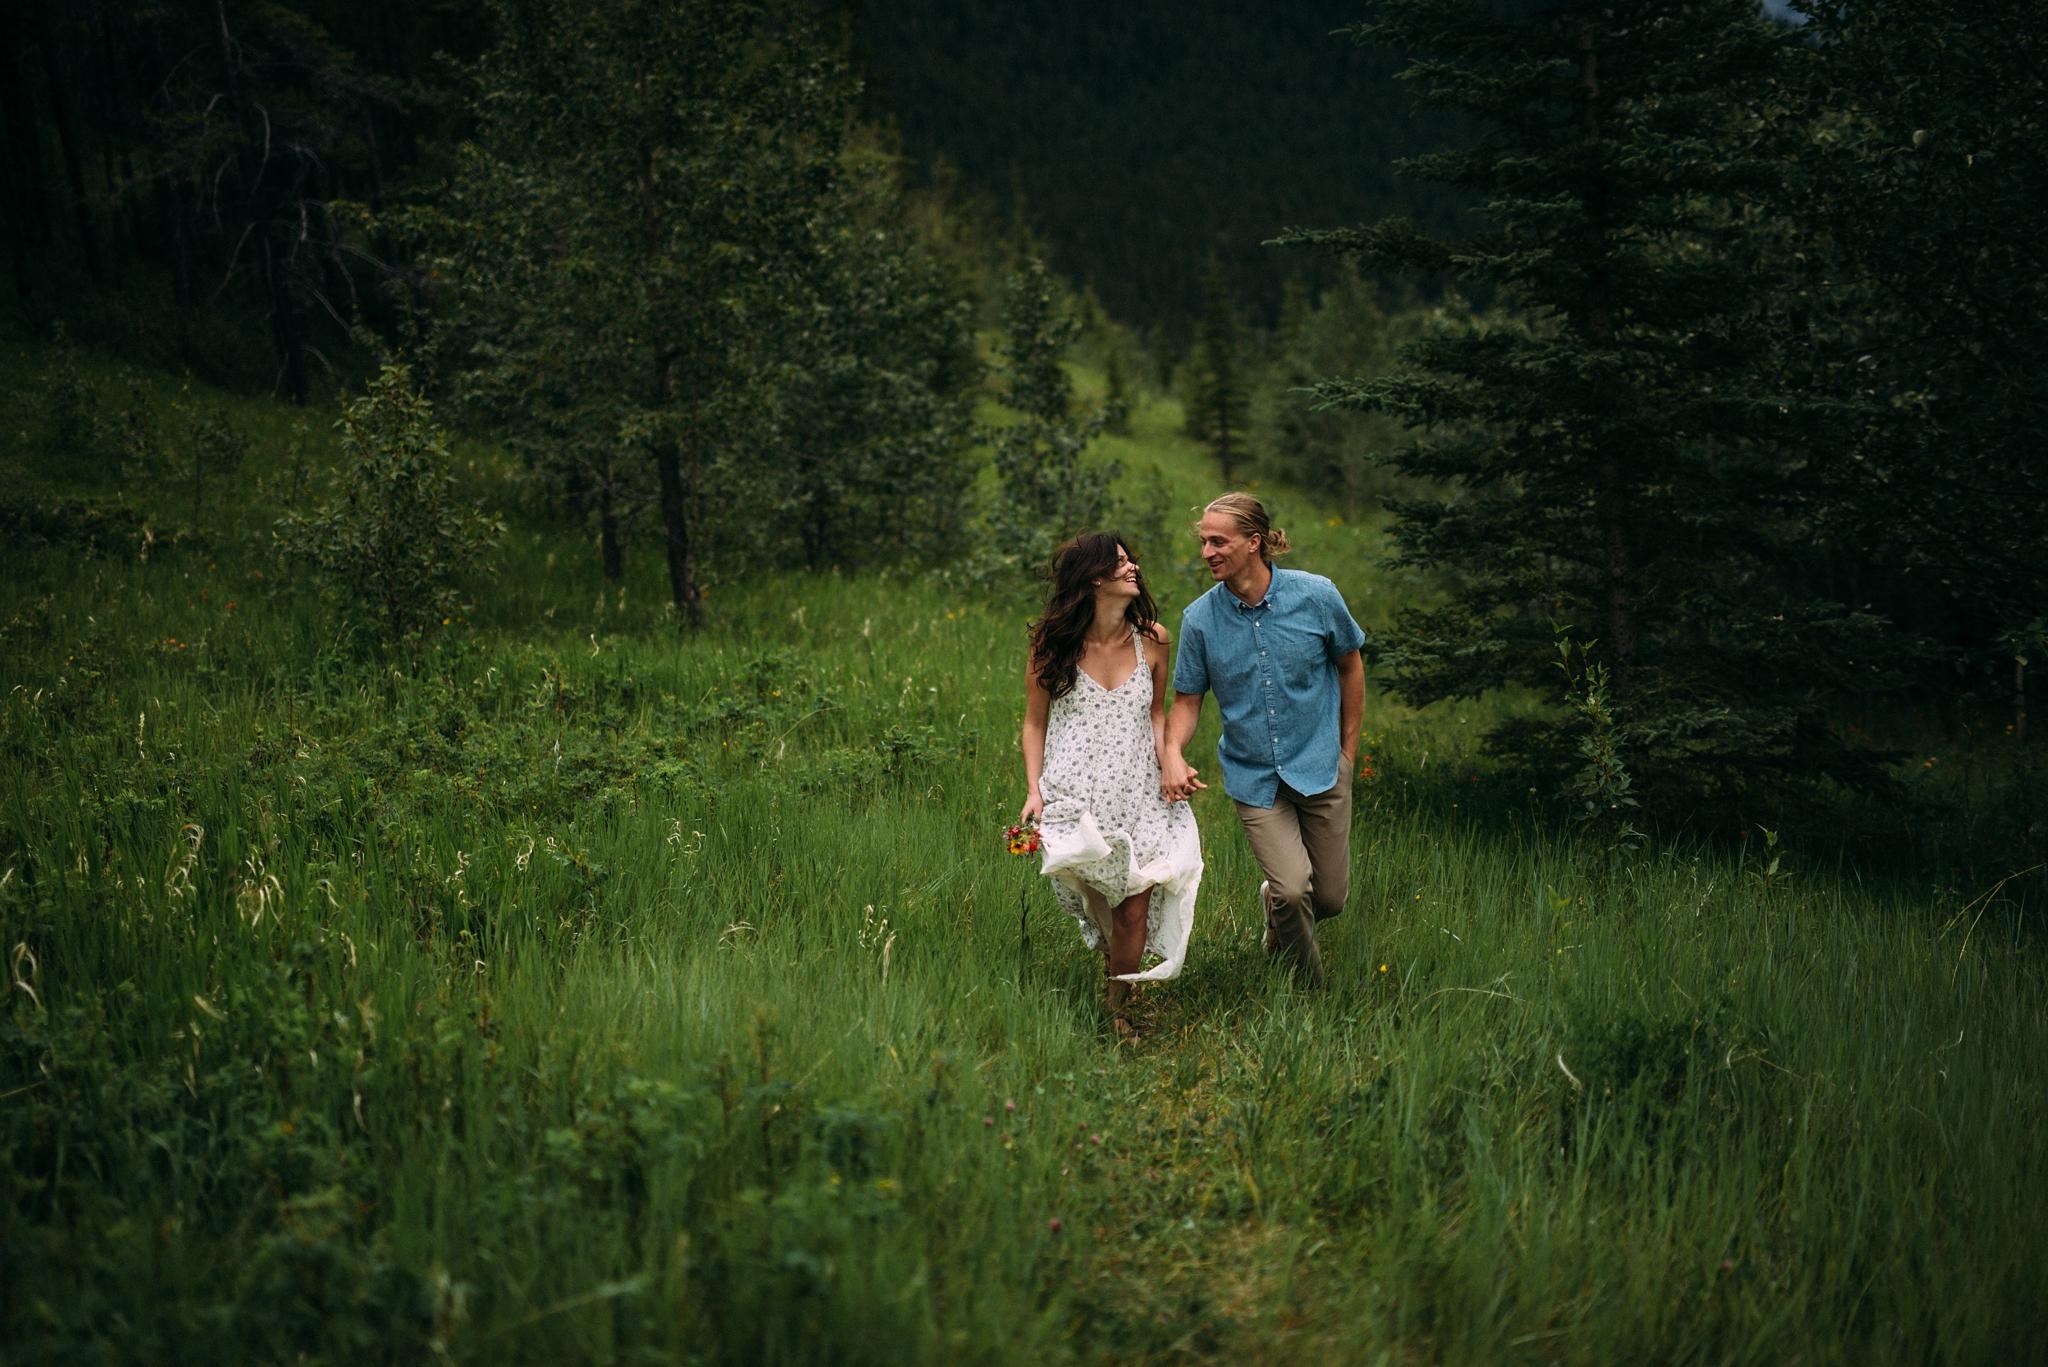 kaihla_tonai_intimate_wedding_elopement_photographer_4200